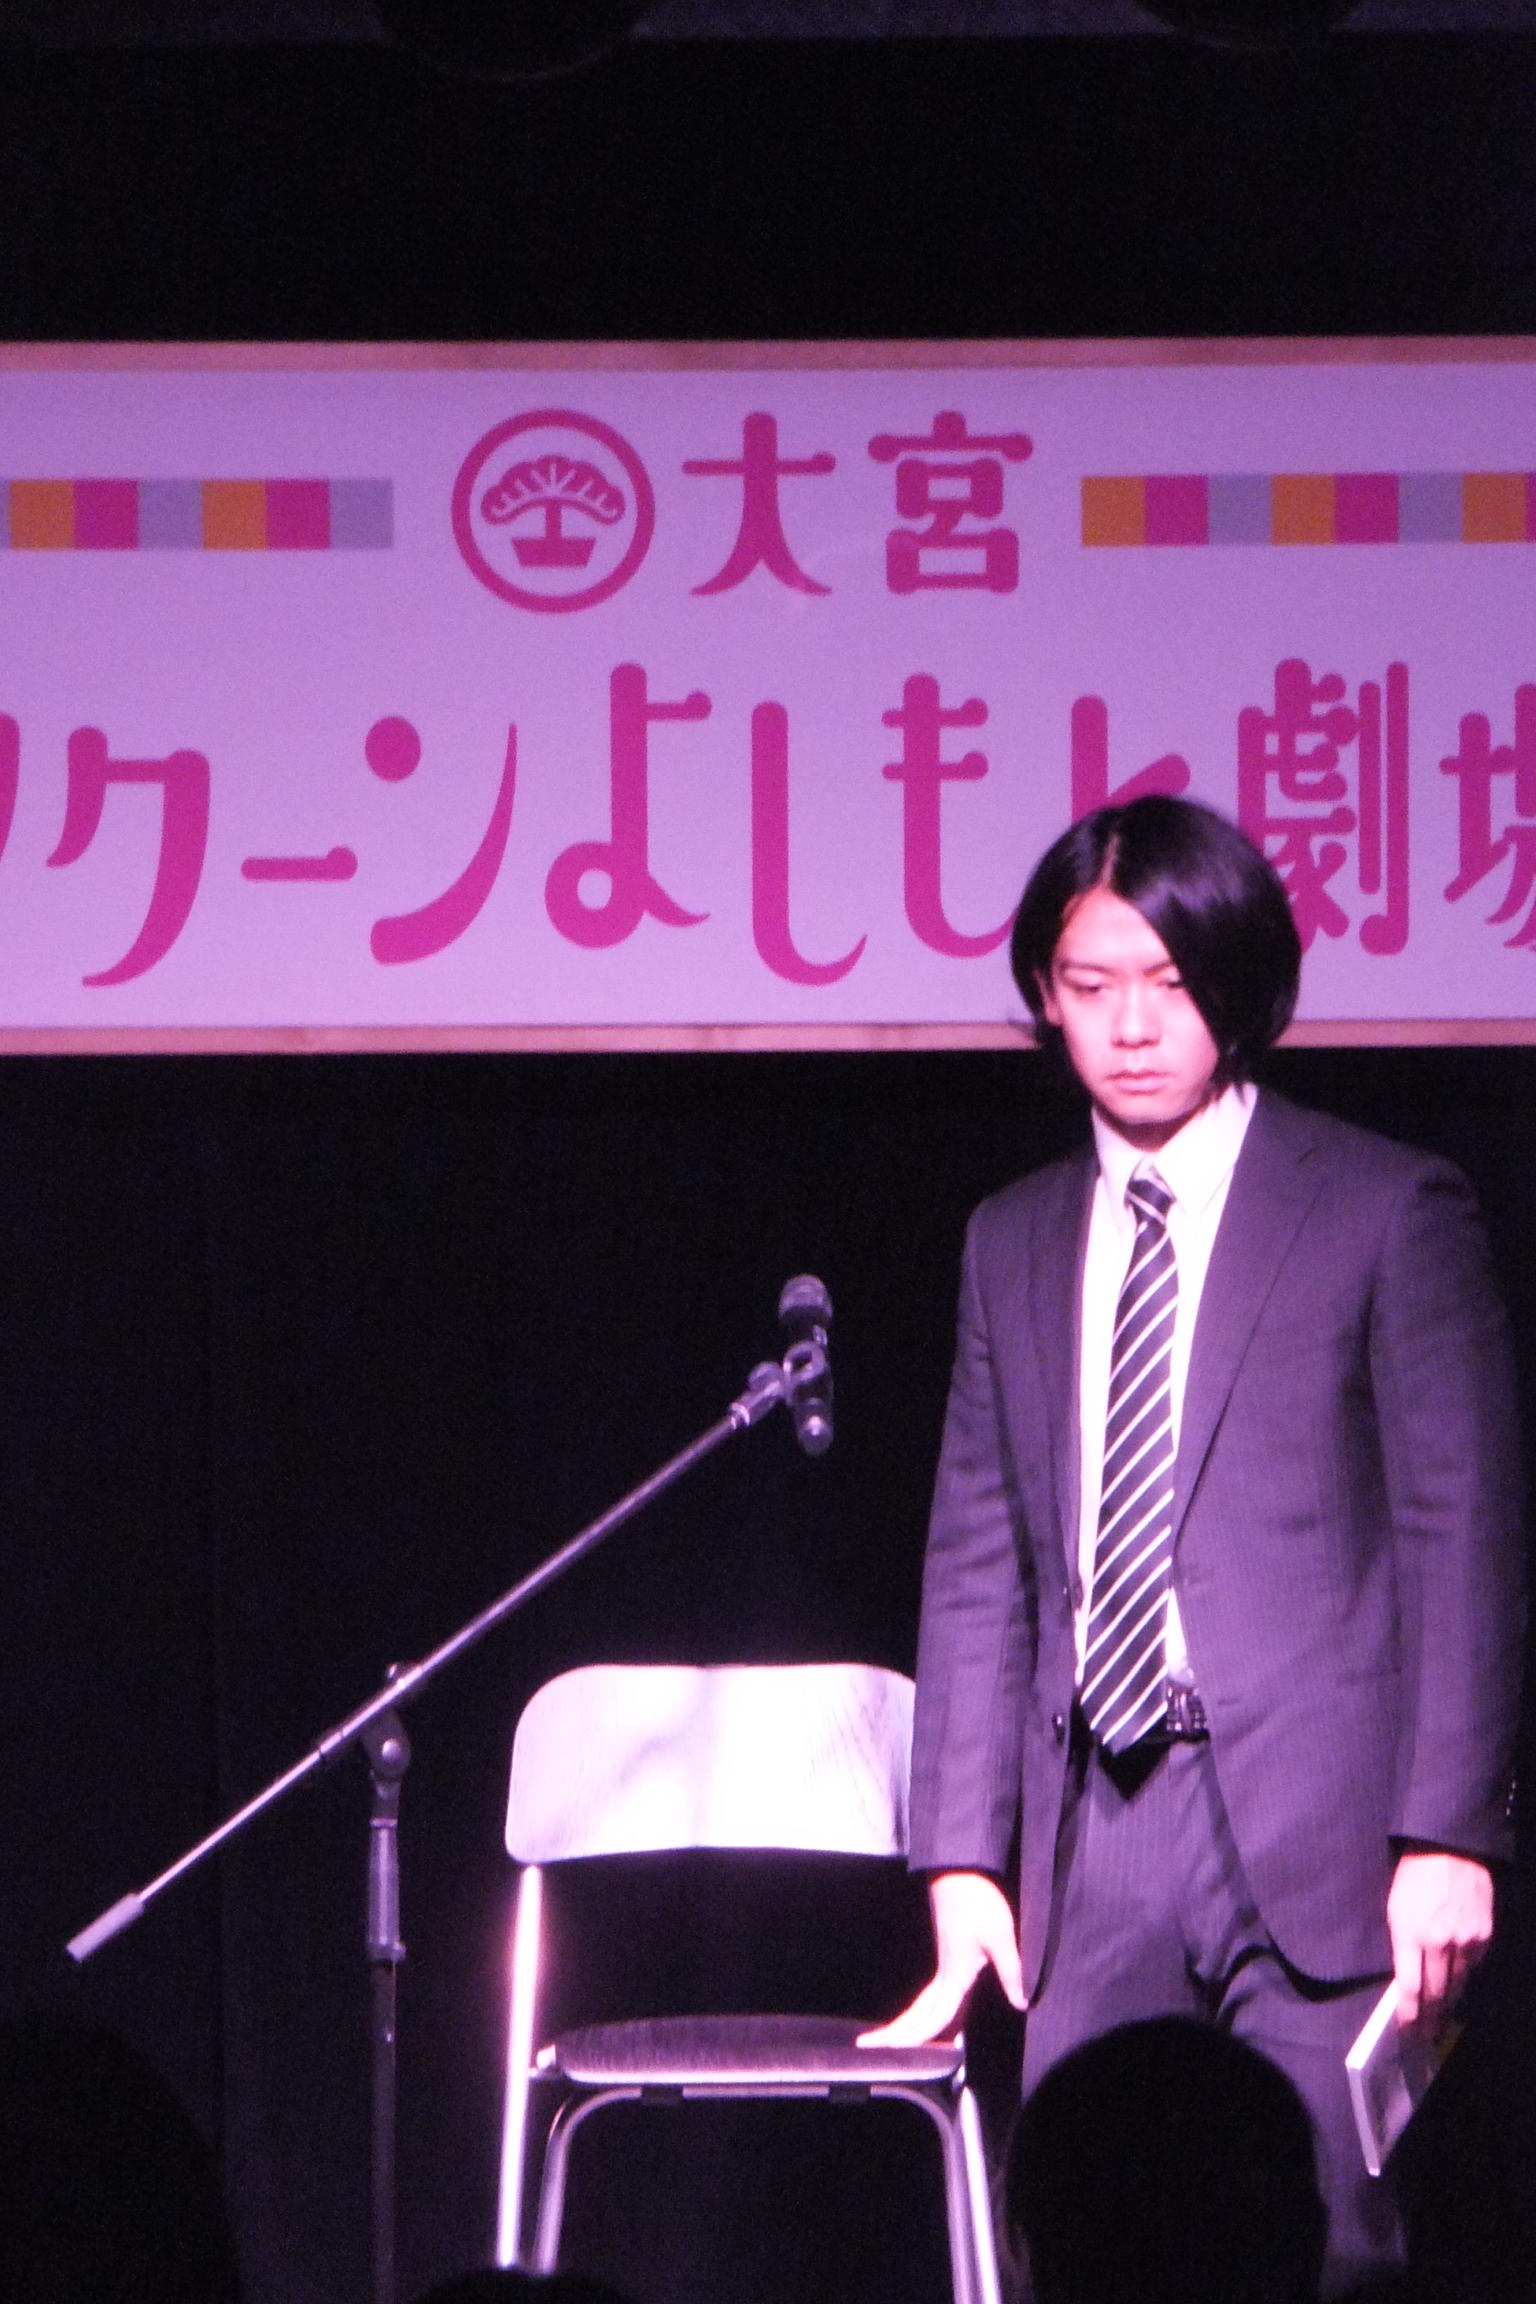 http://news.yoshimoto.co.jp/20151130175252-b6d08fe5a3d74ba51bde4cbc0ca0708fe1510599.jpg